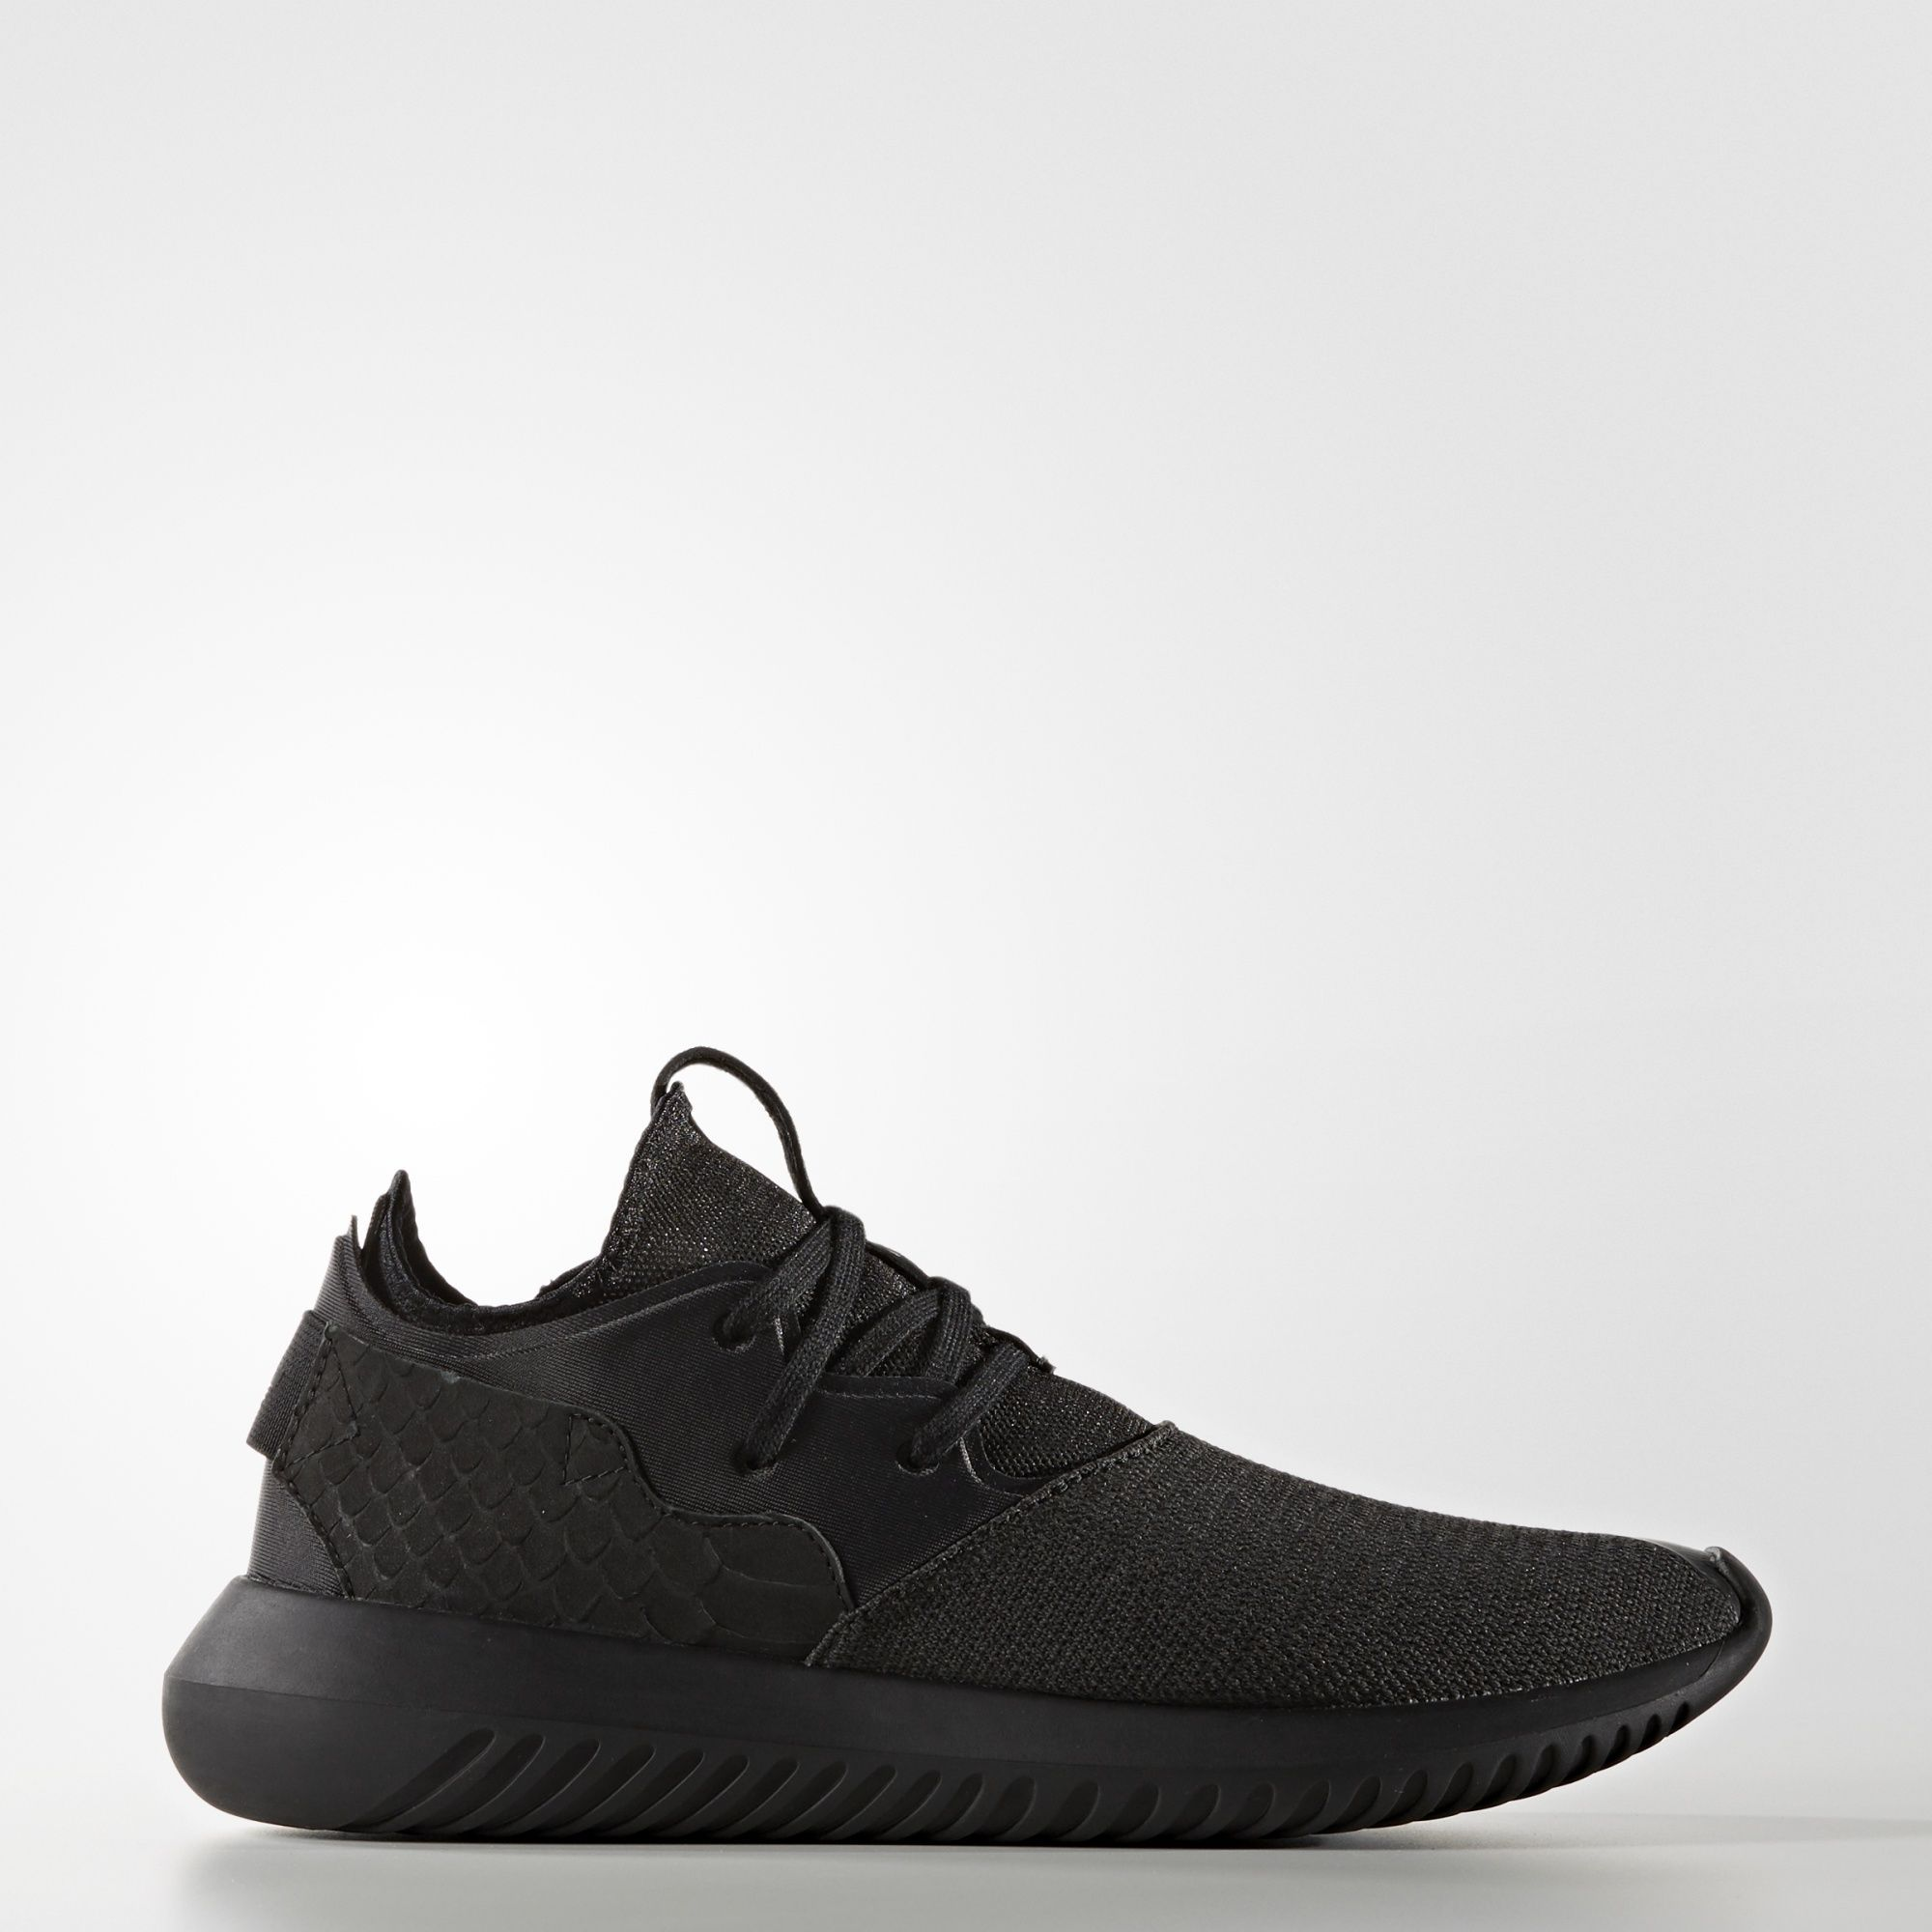 Adidas Tubular X Herren Mid-Cut Sneakers rot schwarz Air Mesh und Leder NEU